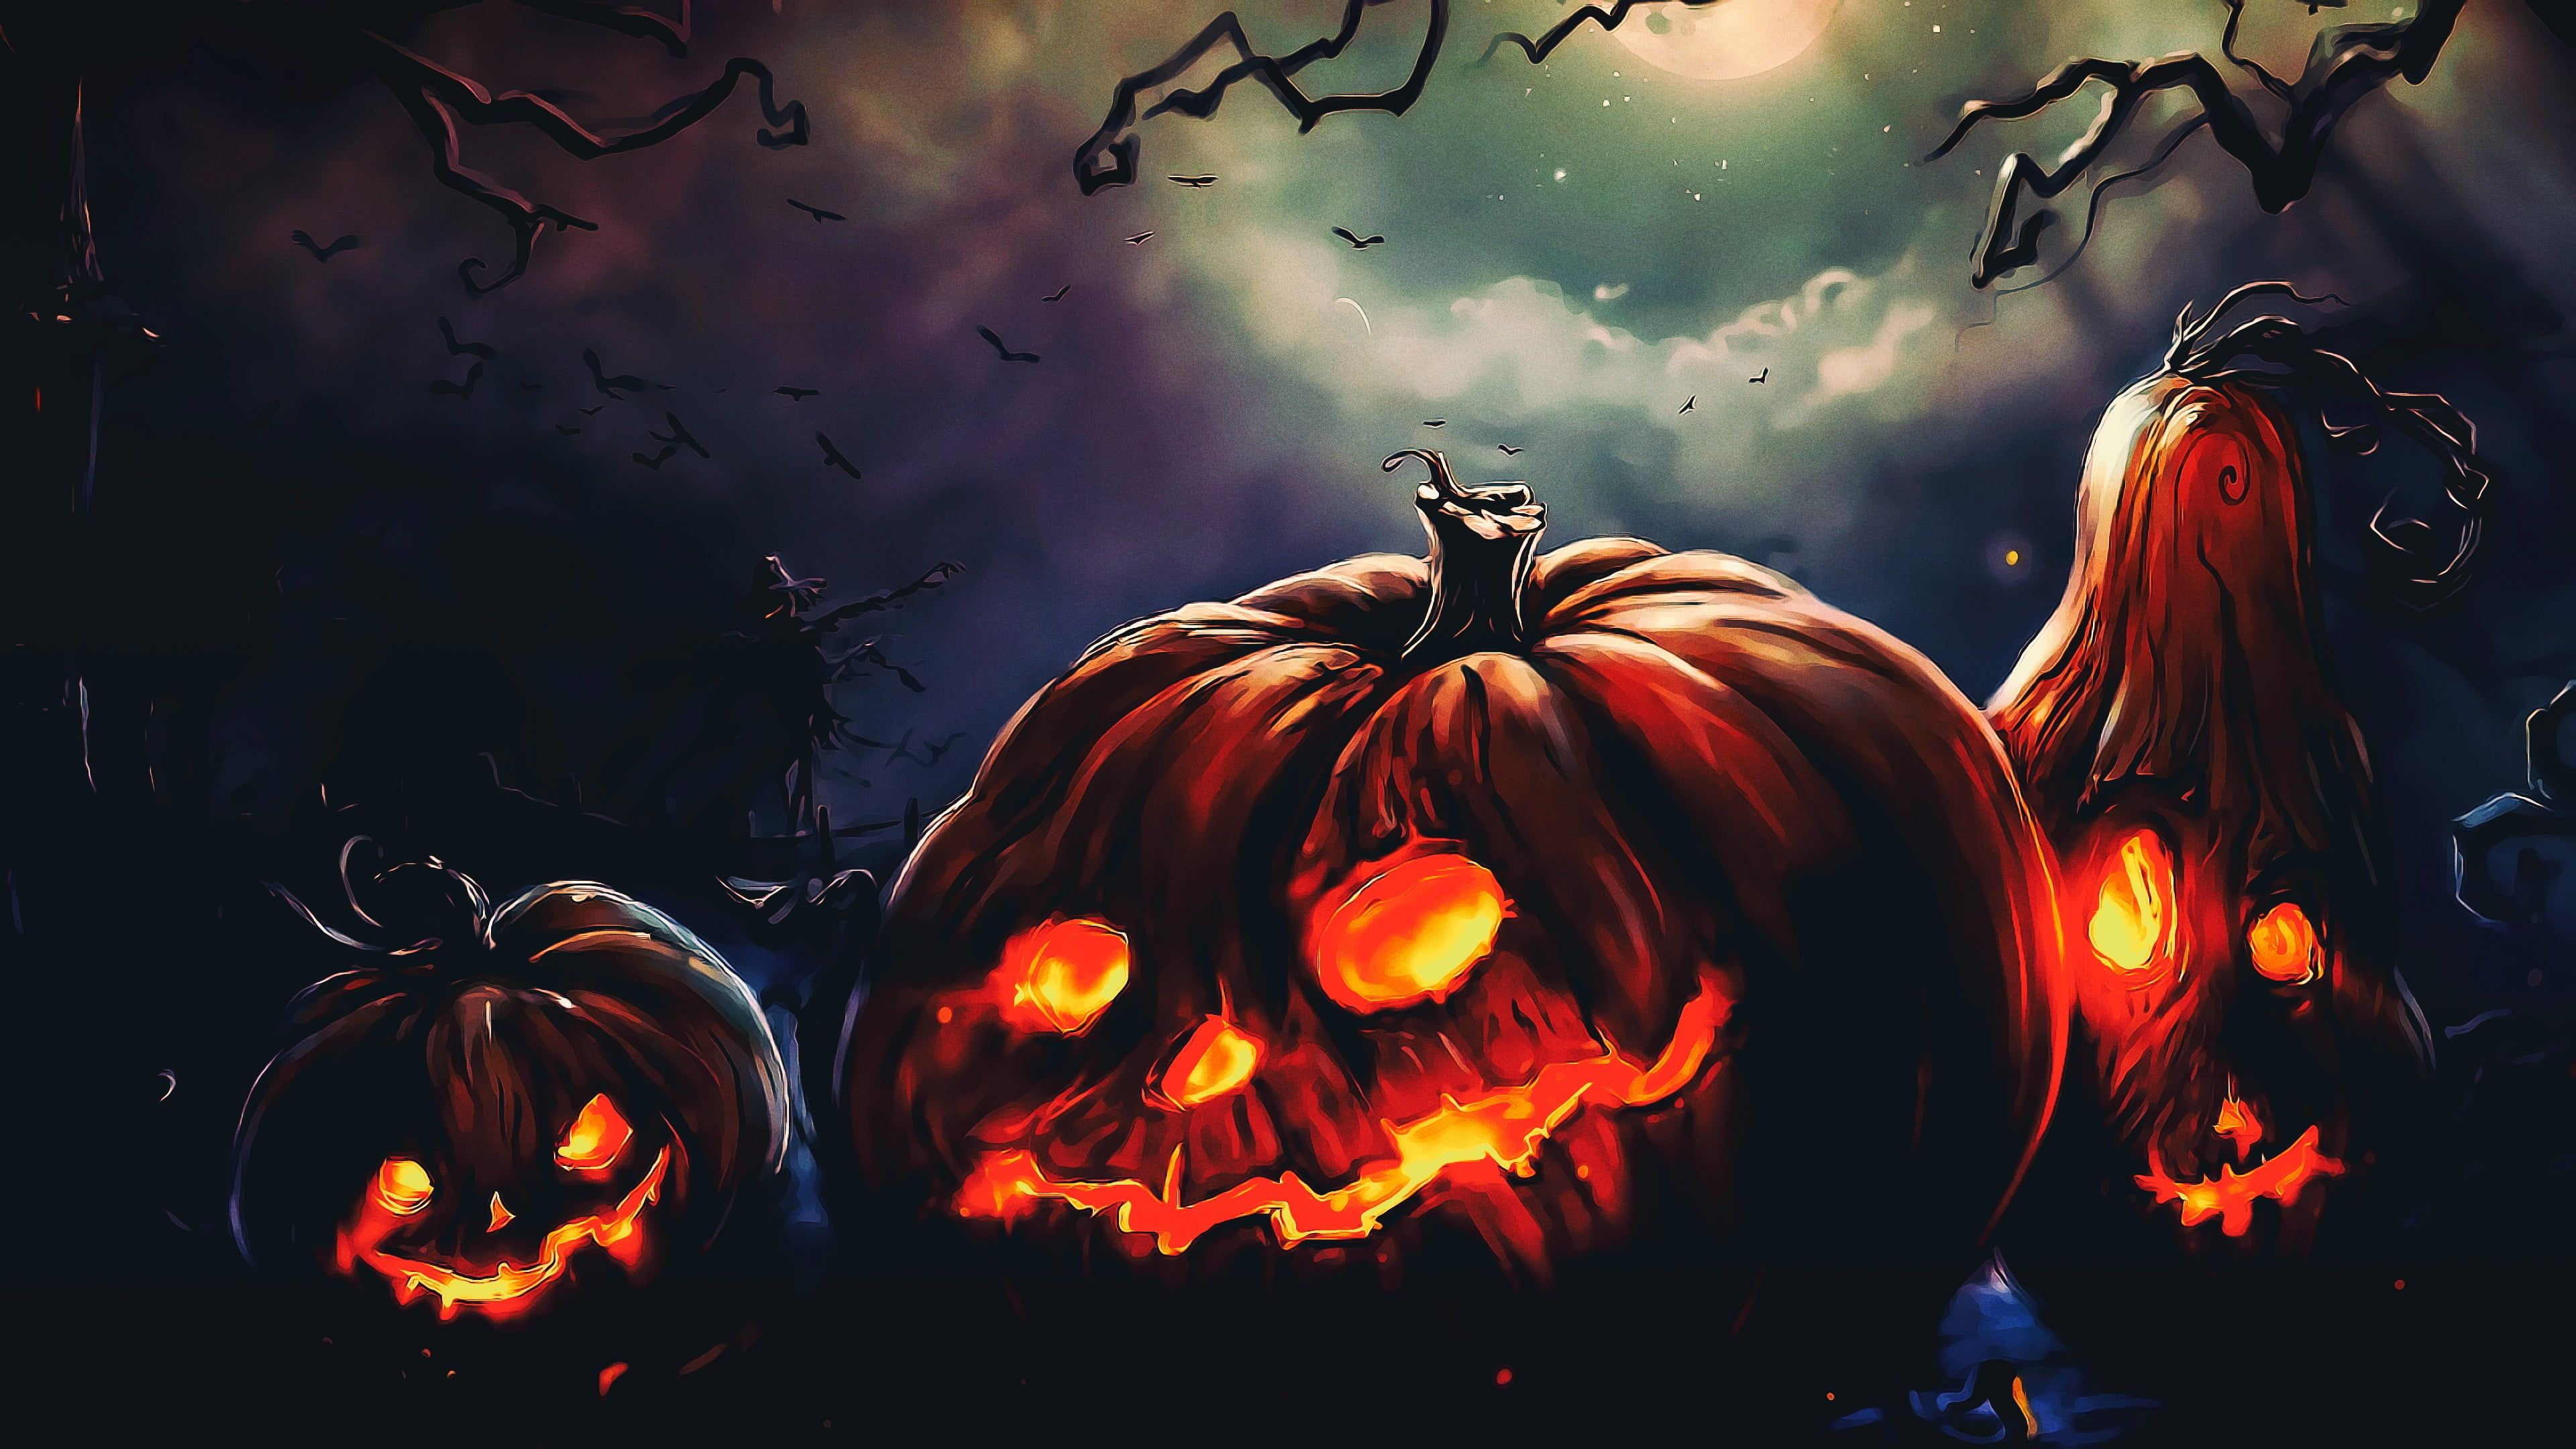 Jack O Lantern Wallpaper Halloween Terror Night Fantasy Art Photoshop 4k Wallpaper Hdwallpaper Desktop Halloween Decoracao Halloween Decoracao